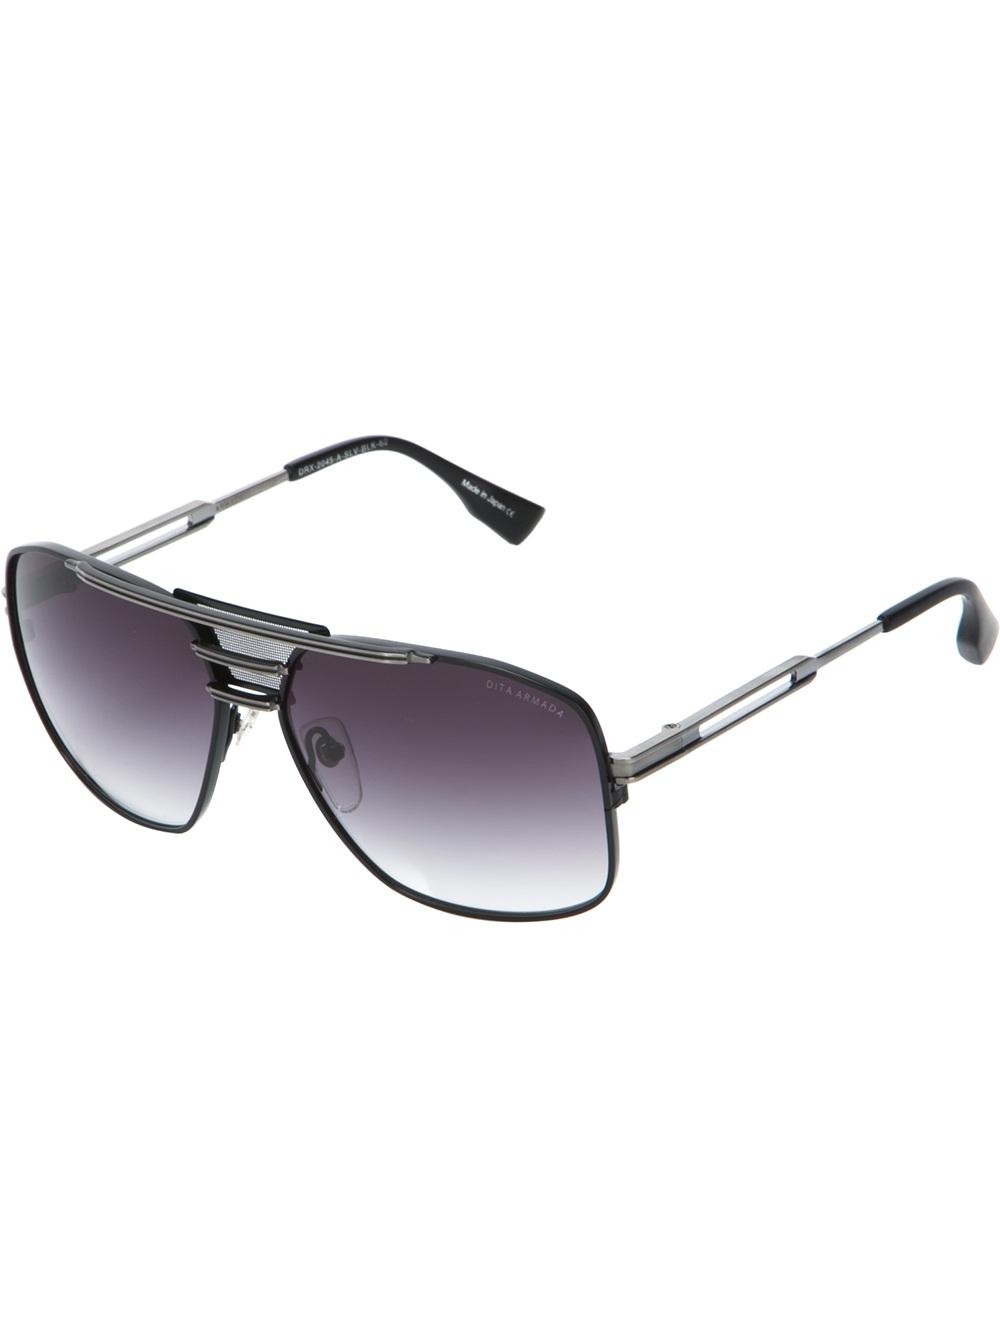 7c94a1008f Lyst - DITA Armada Sunglasses in Black for Men